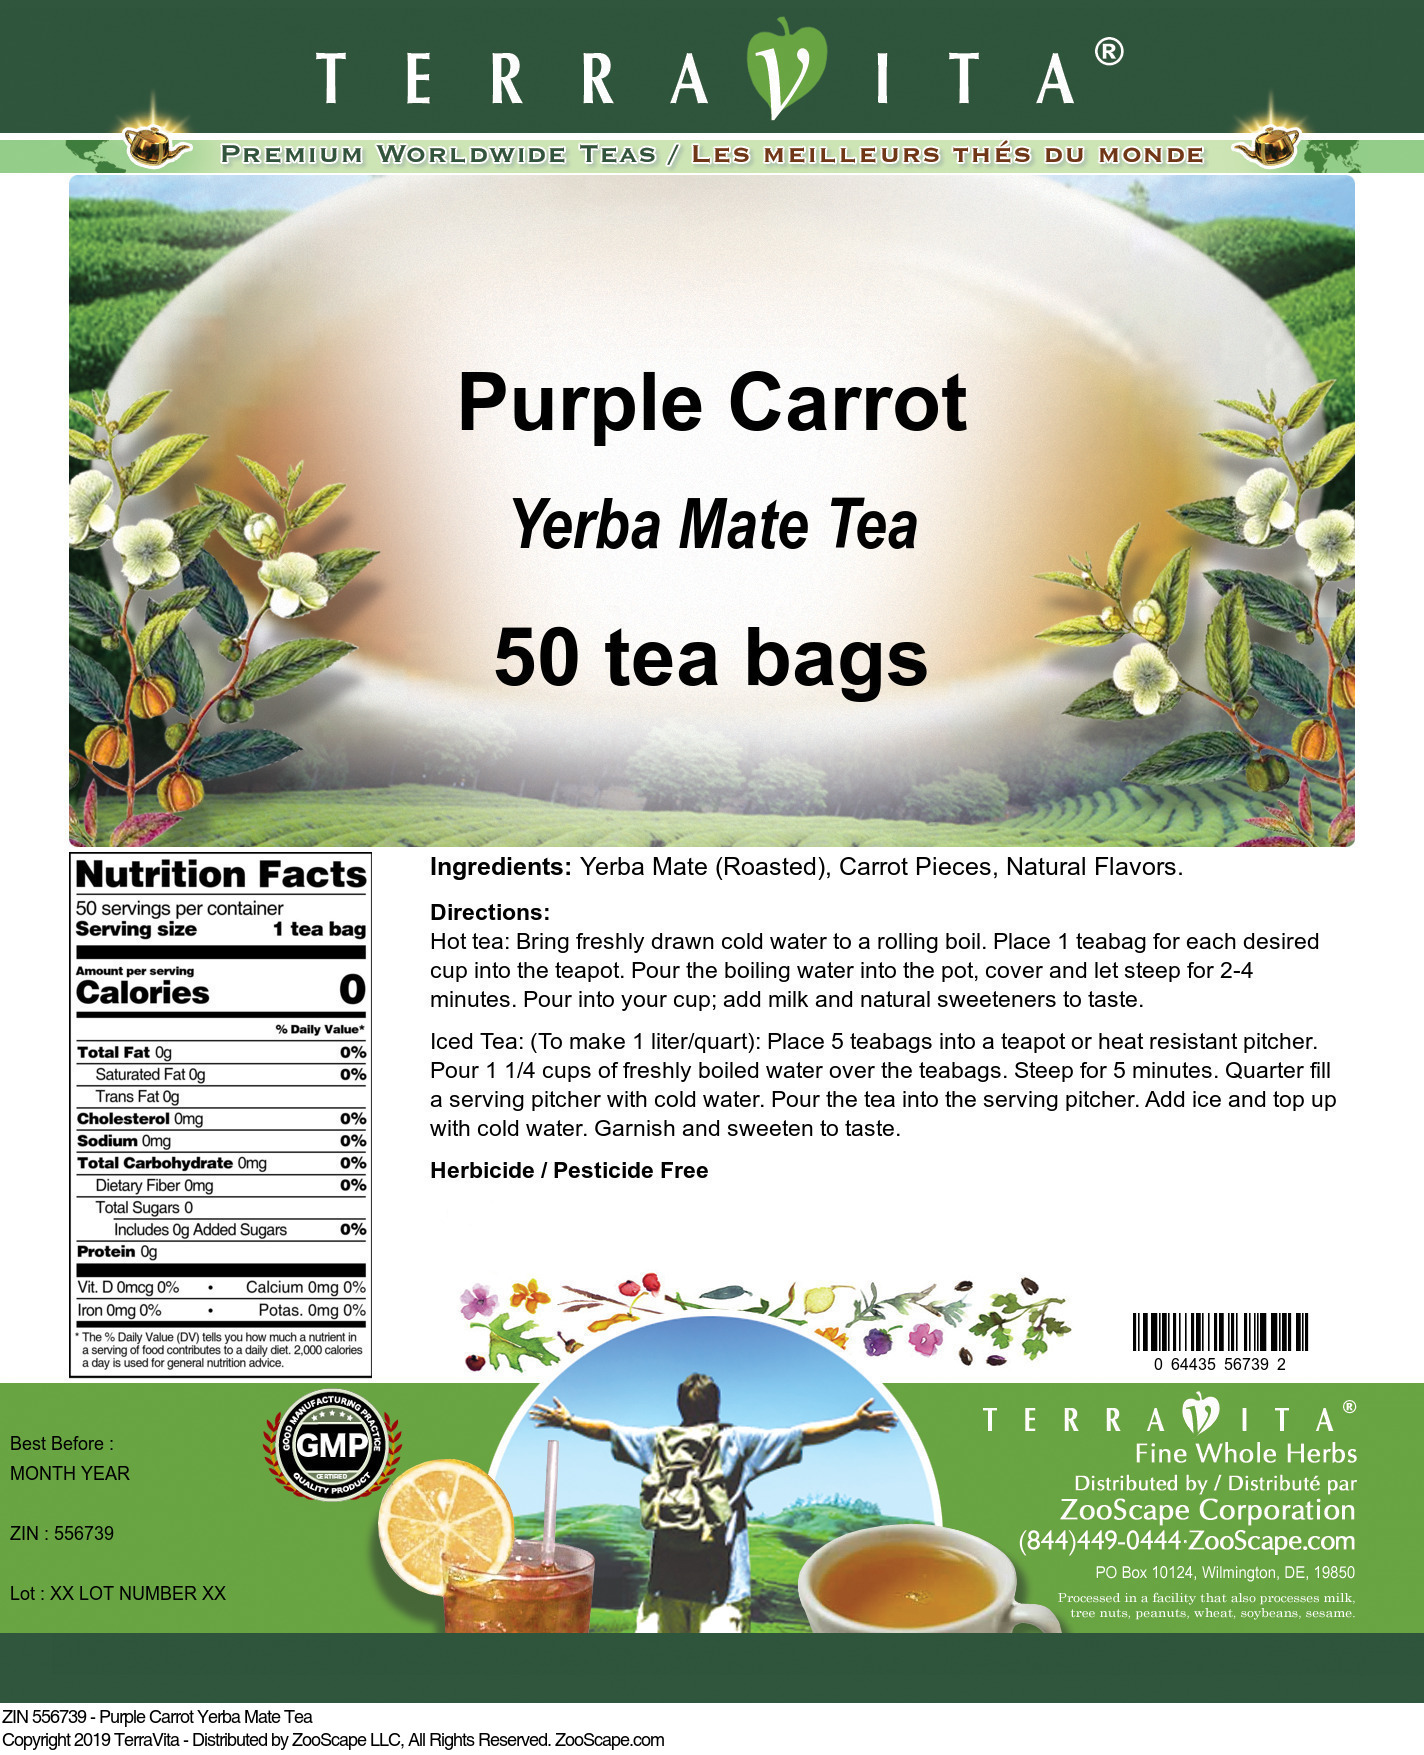 Purple Carrot Yerba Mate